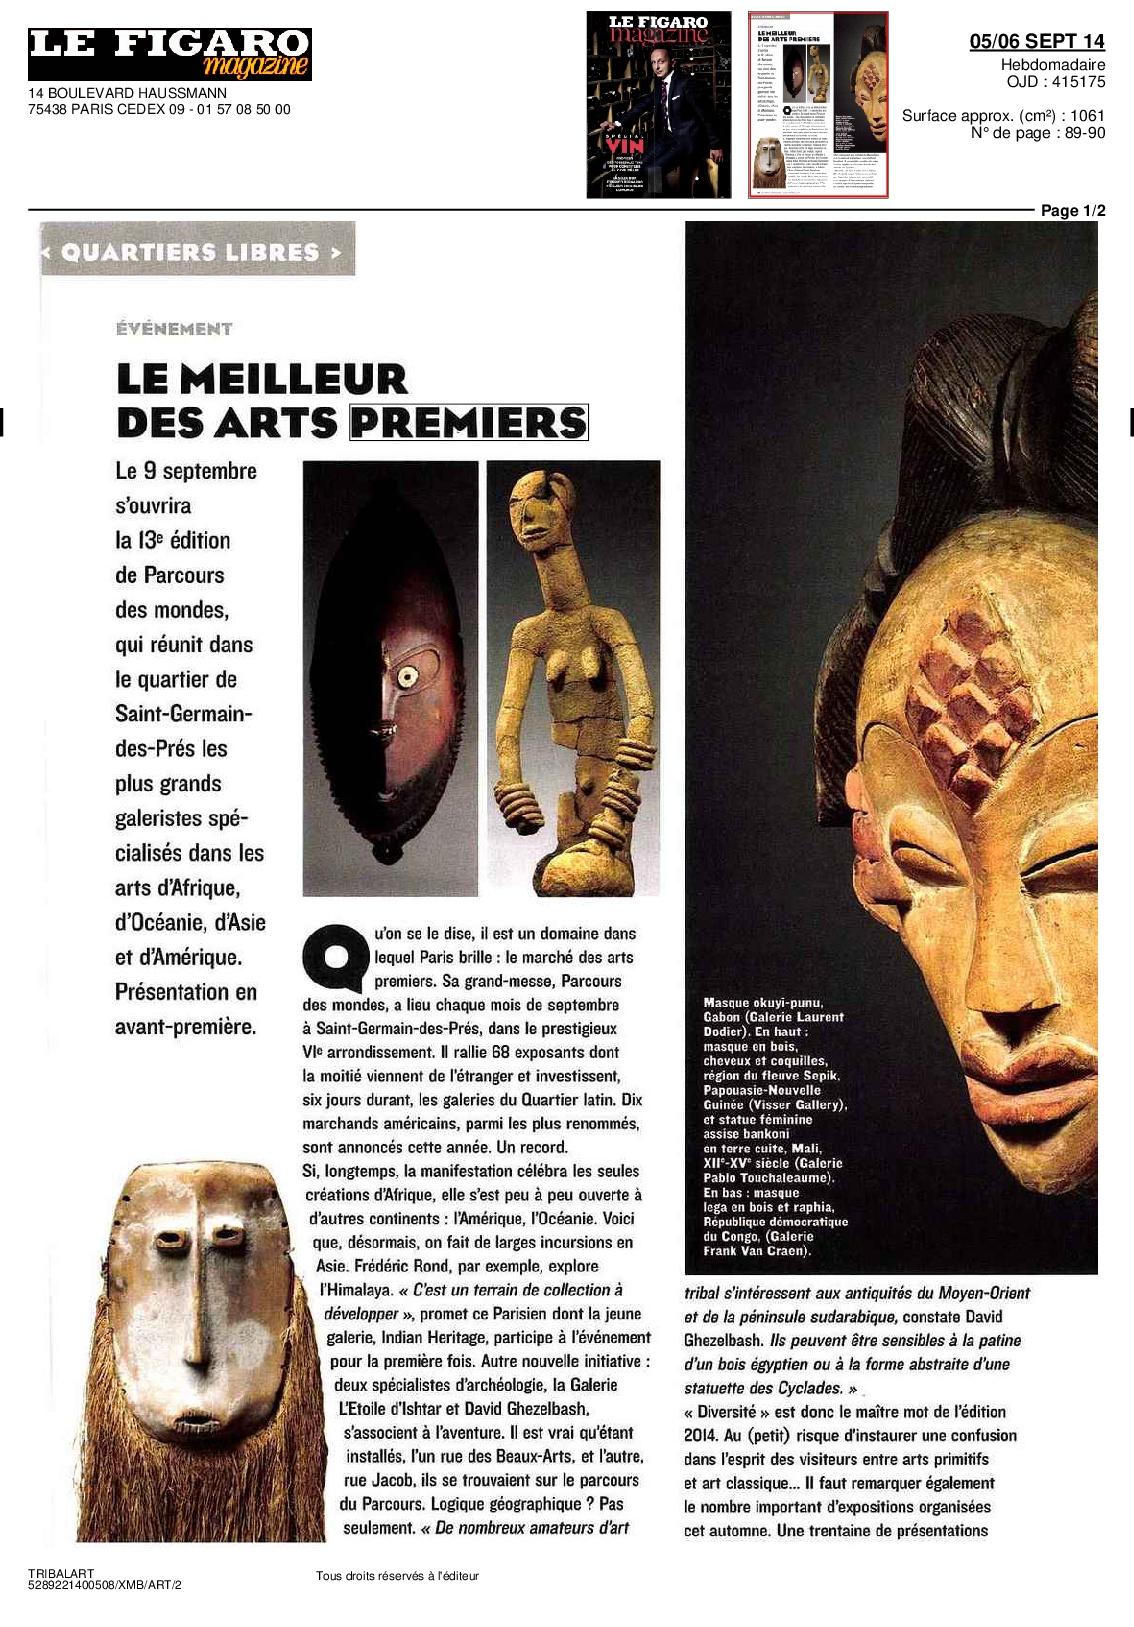 Le Figaro Magazine 05/06 Sept 2014